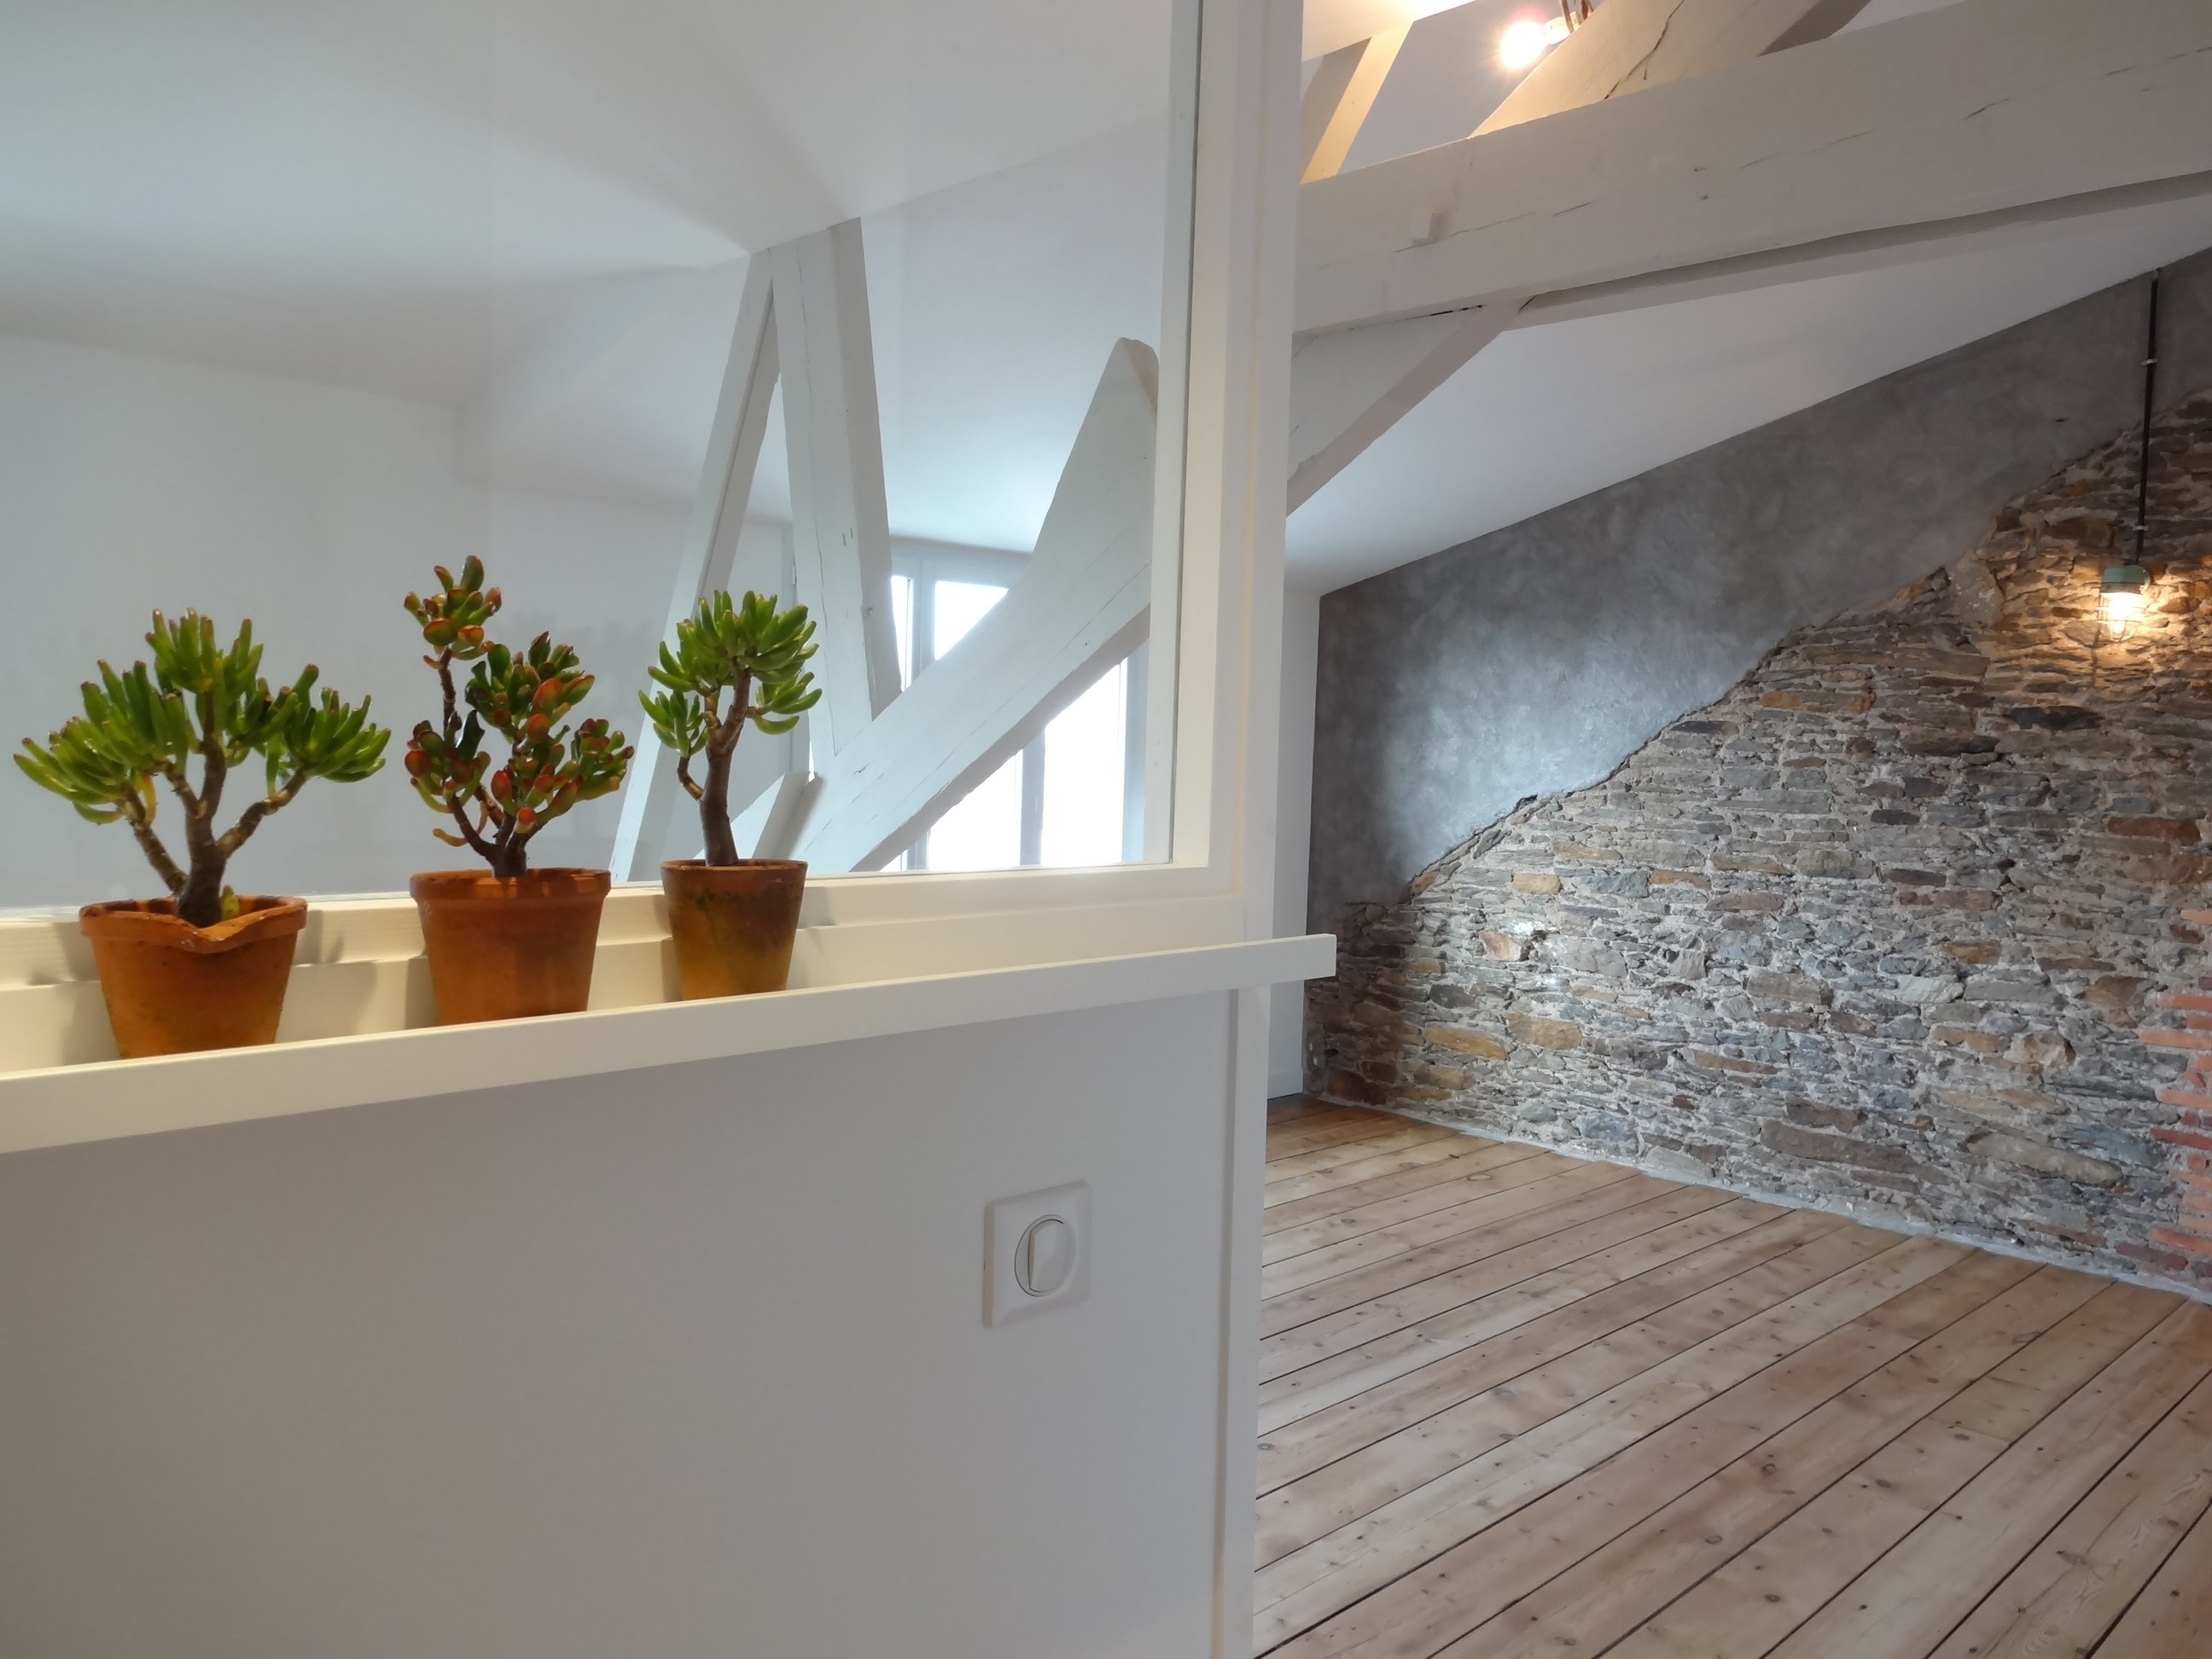 Отделка квартиры студии в стиле лофт